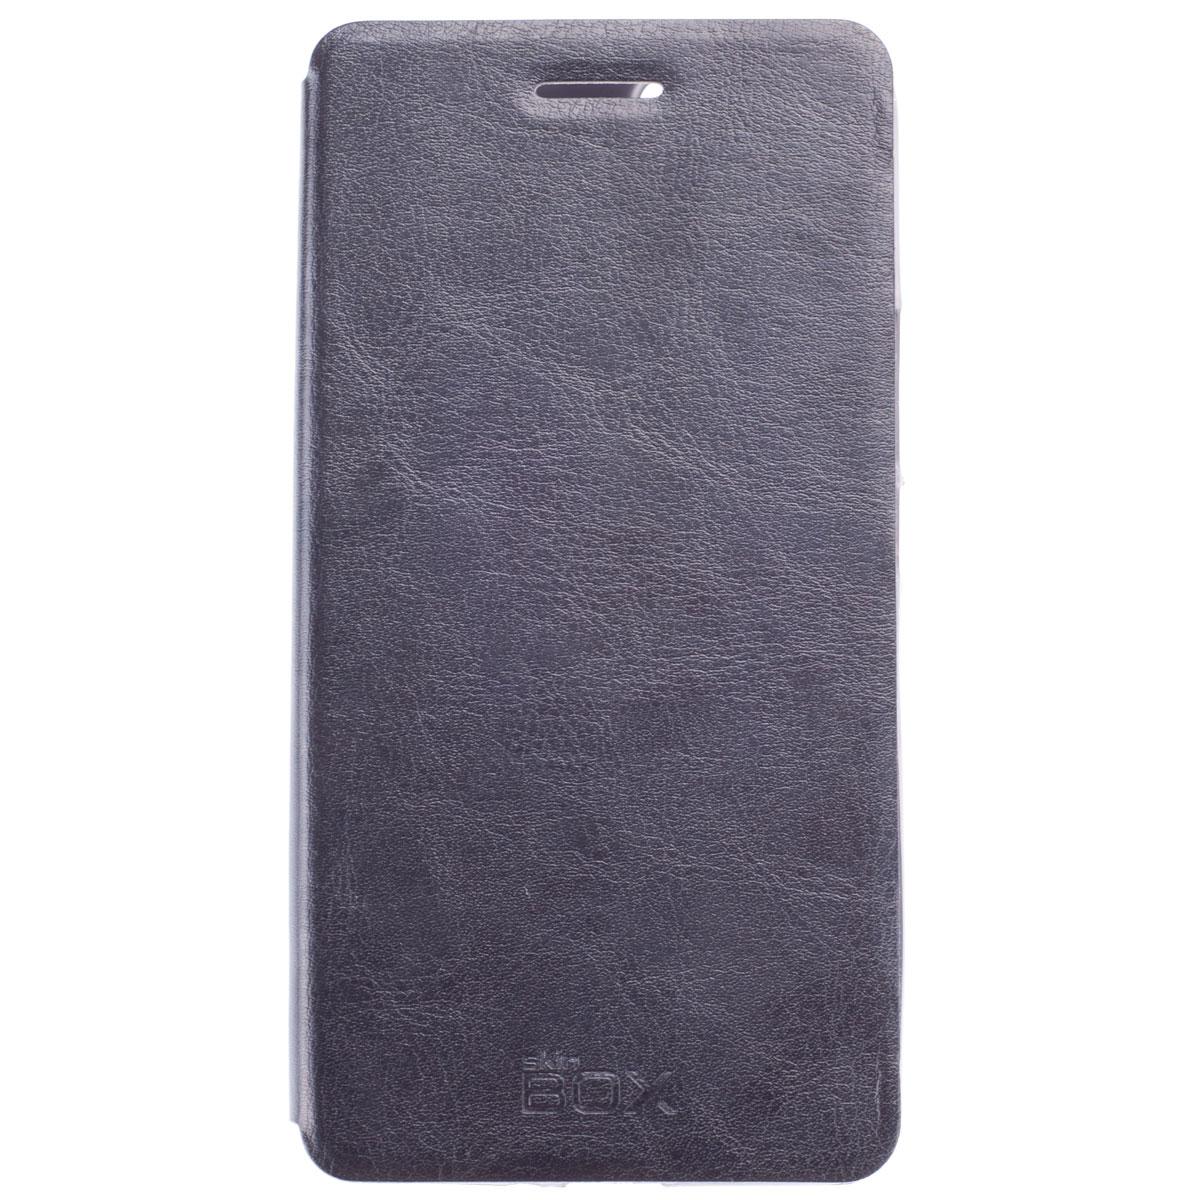 Skinbox Lux чехол для Huawei Honor 6 Plus, Black сотовый телефон huawei honor 8 pro black